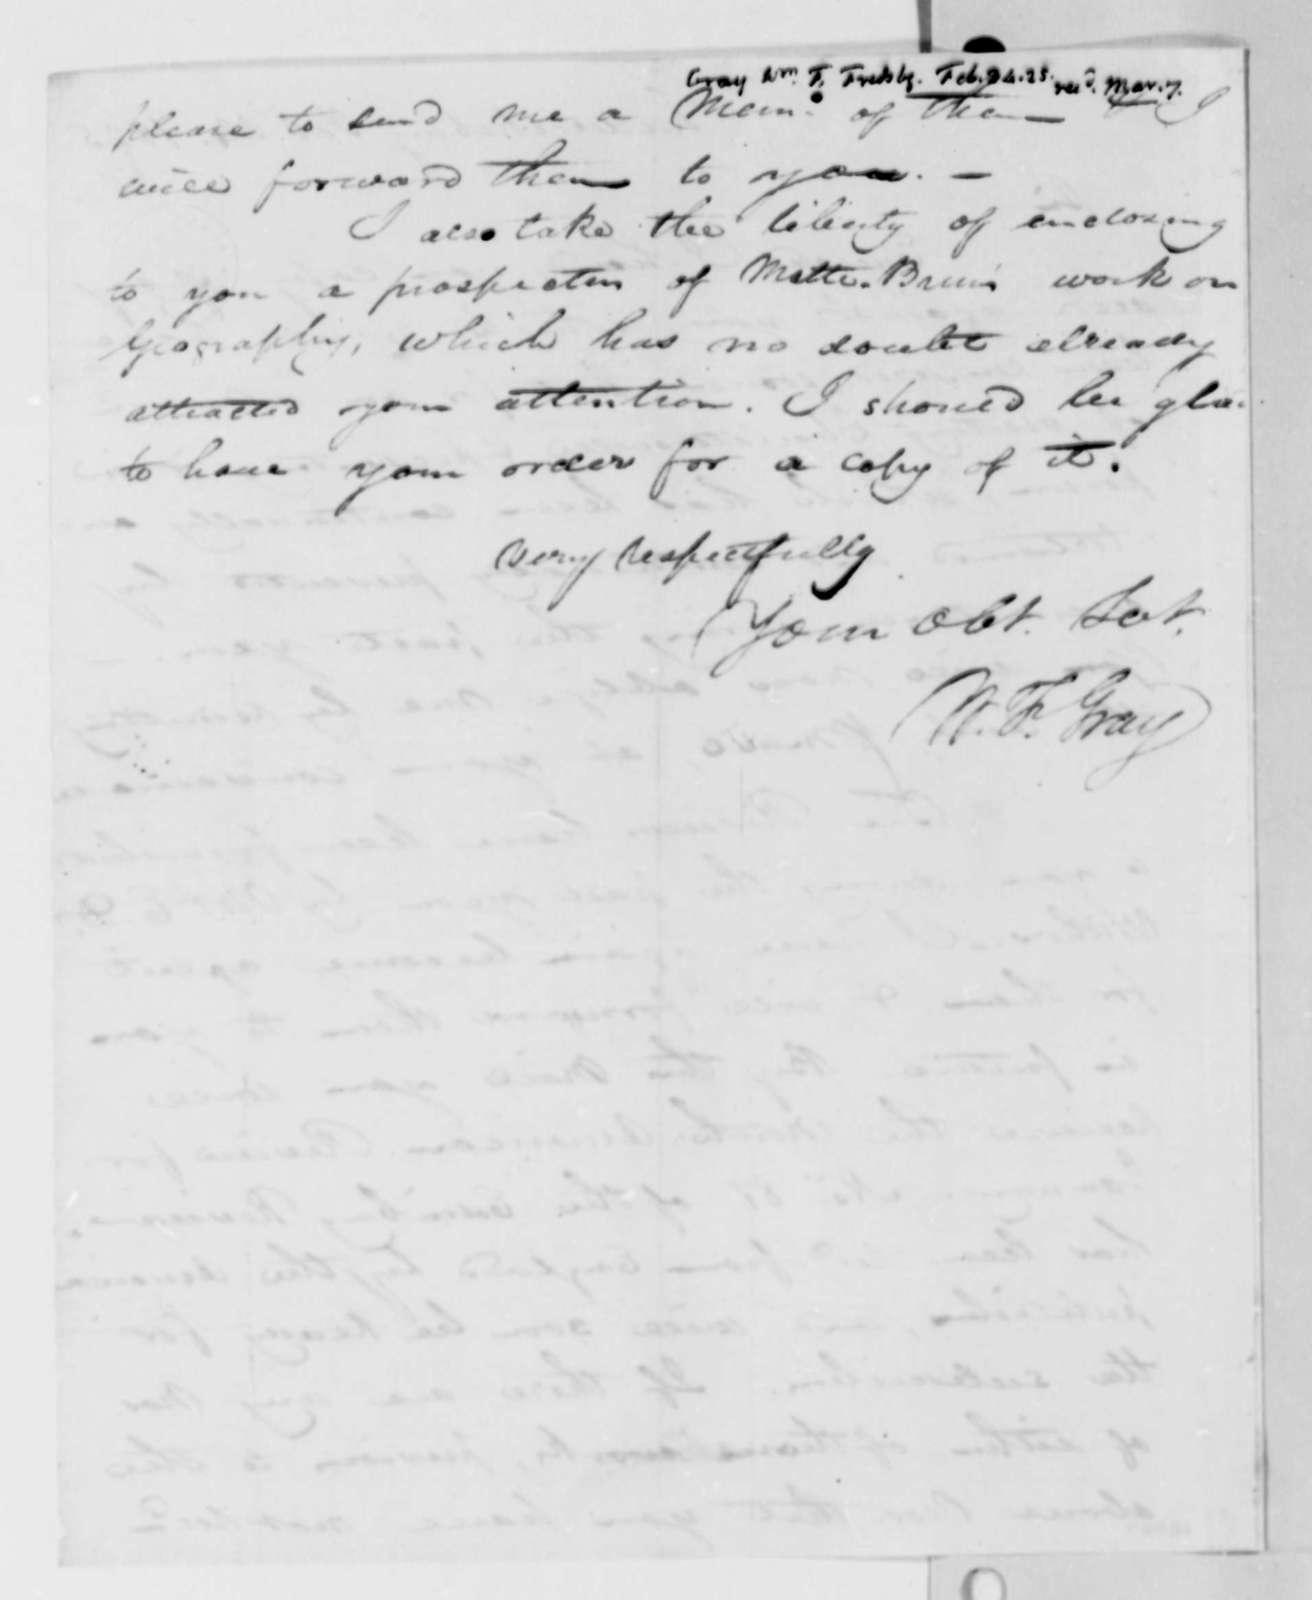 William F. Gray to Thomas Jefferson, February 24, 1825